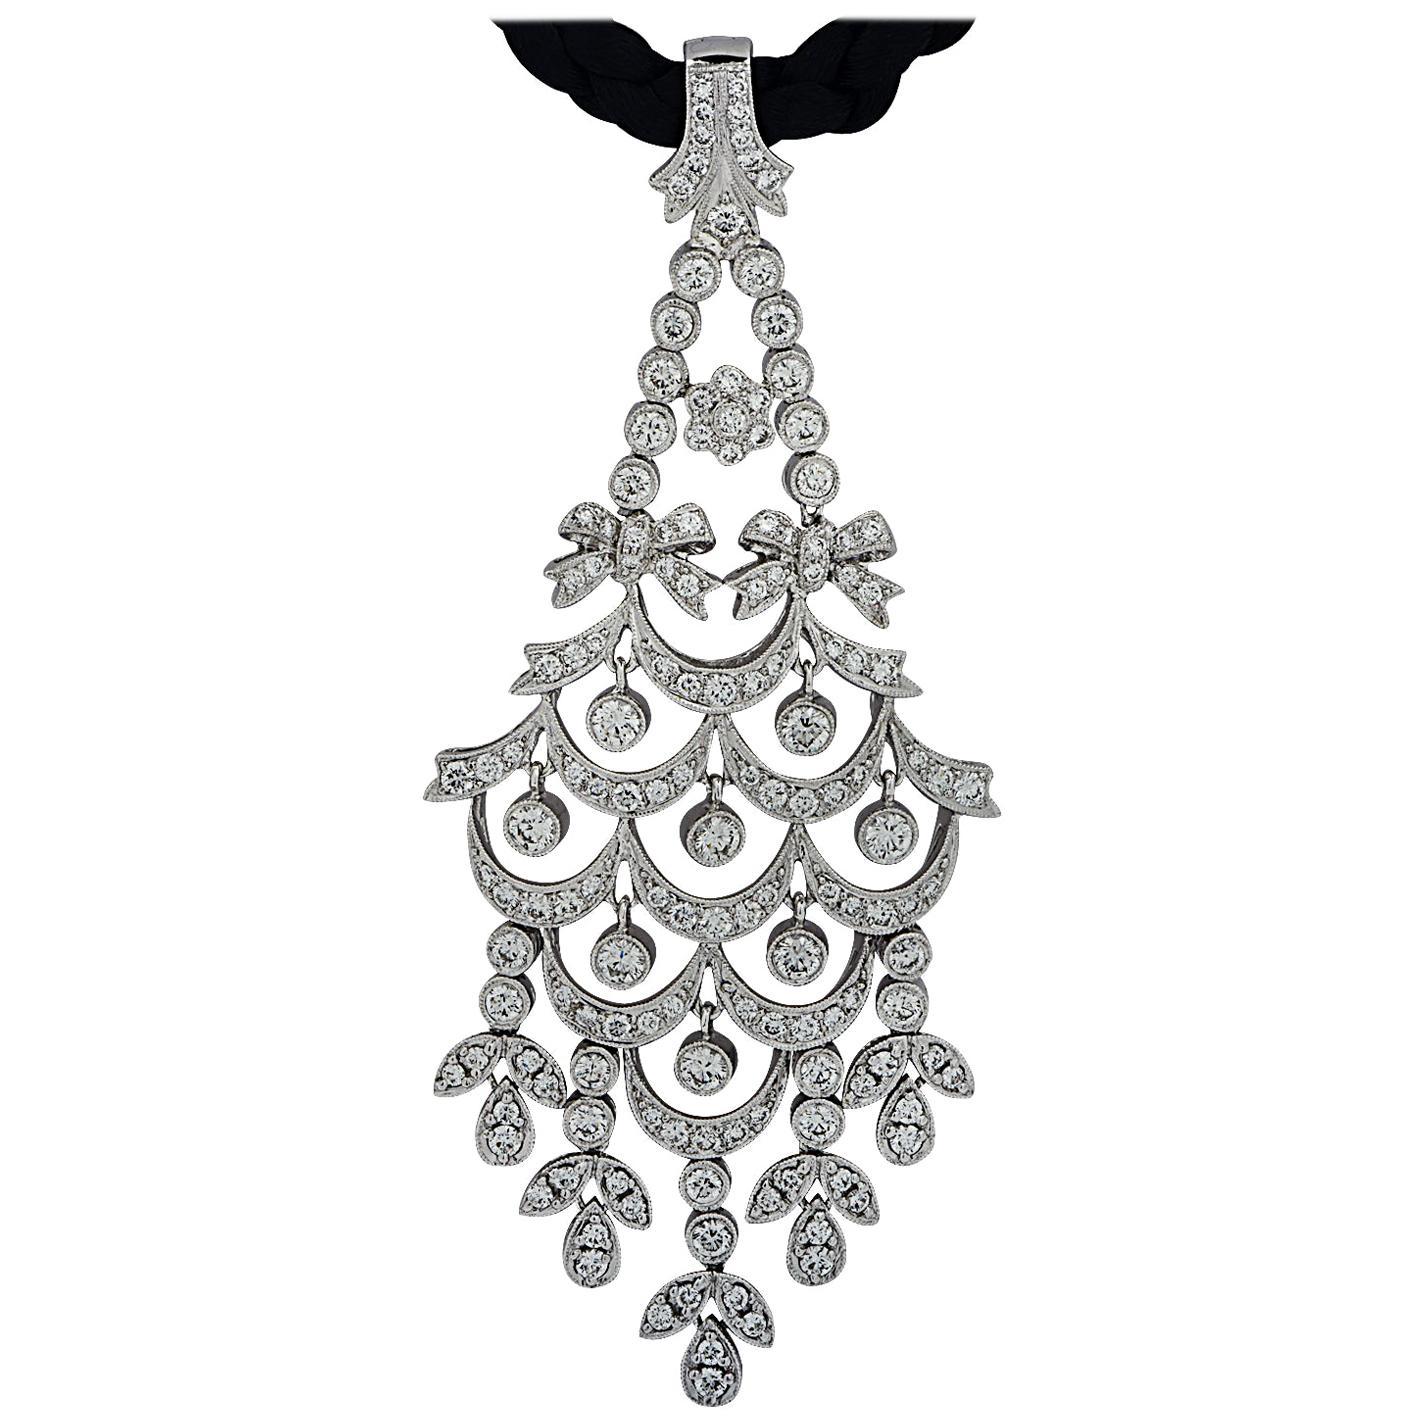 5 Carat Diamond Chandelier Pendant Necklace